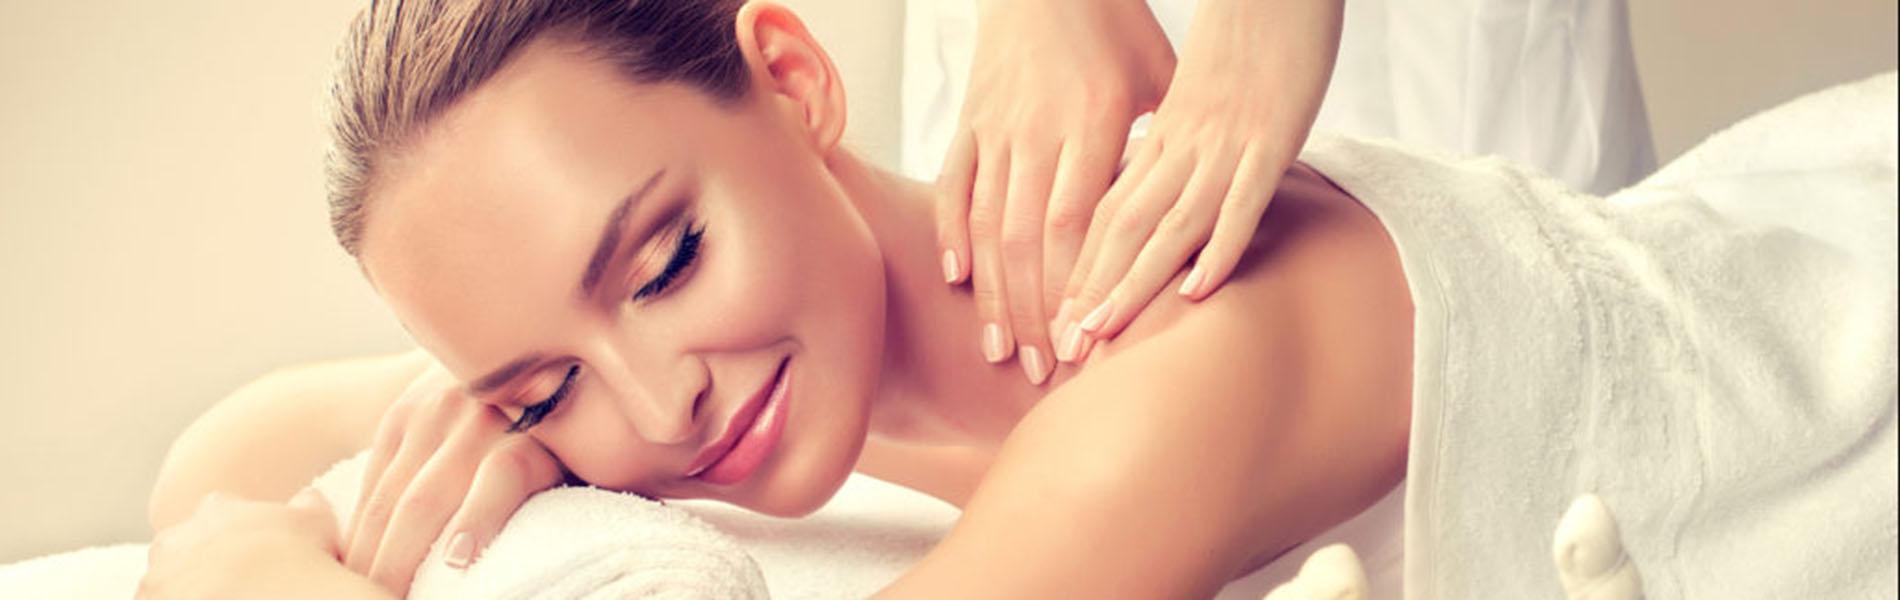 Deep Tissue, Swedish & Relaxation Massage